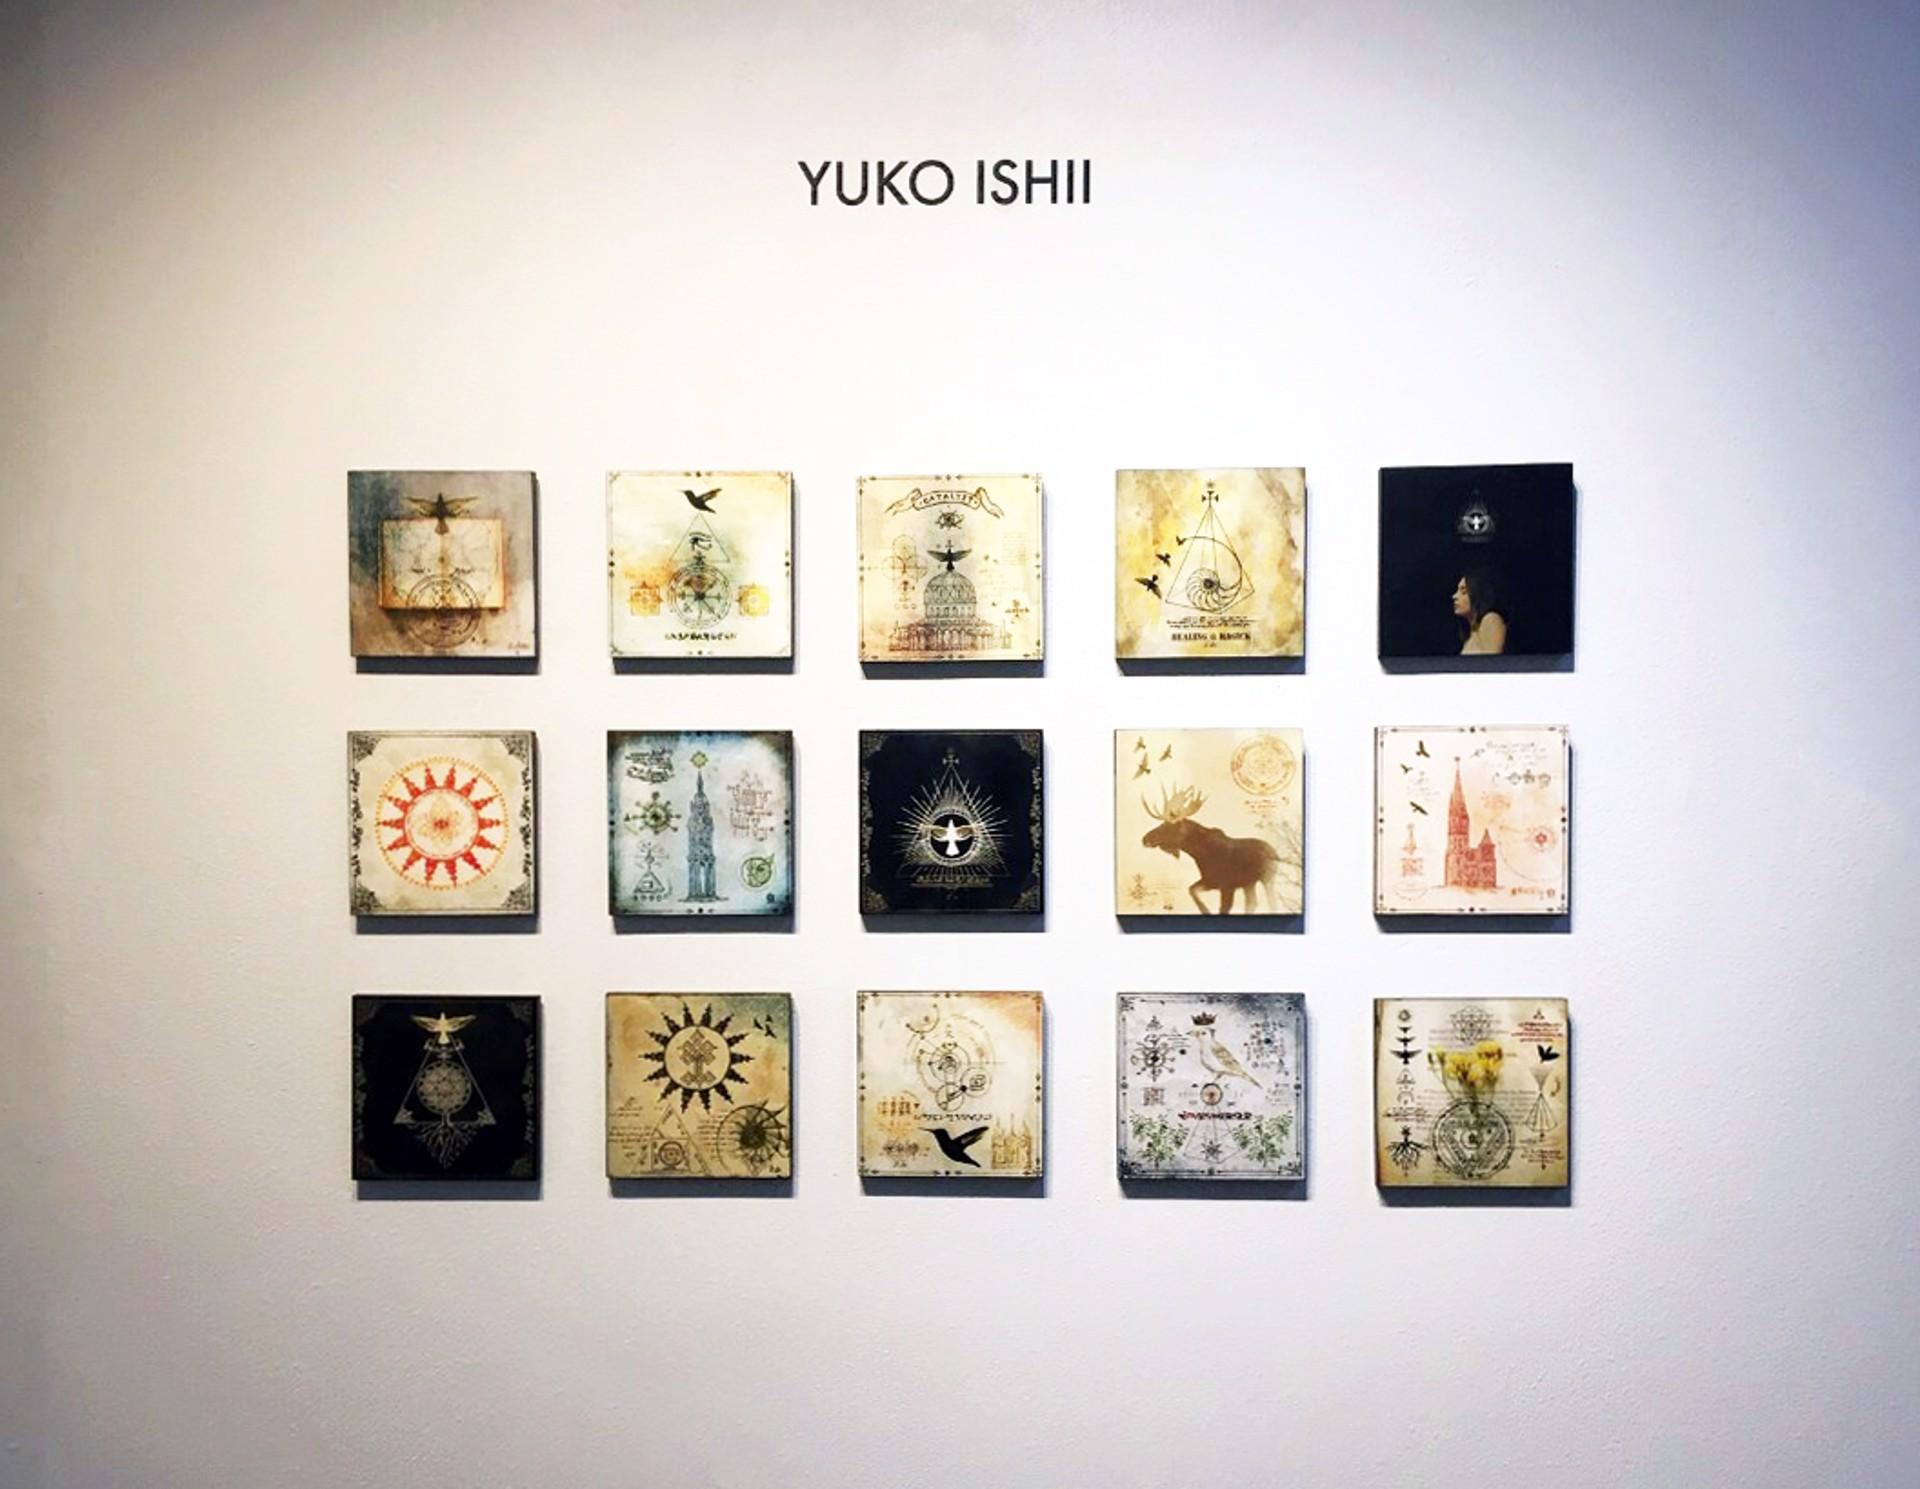 King of Balance by Yuko Ishii